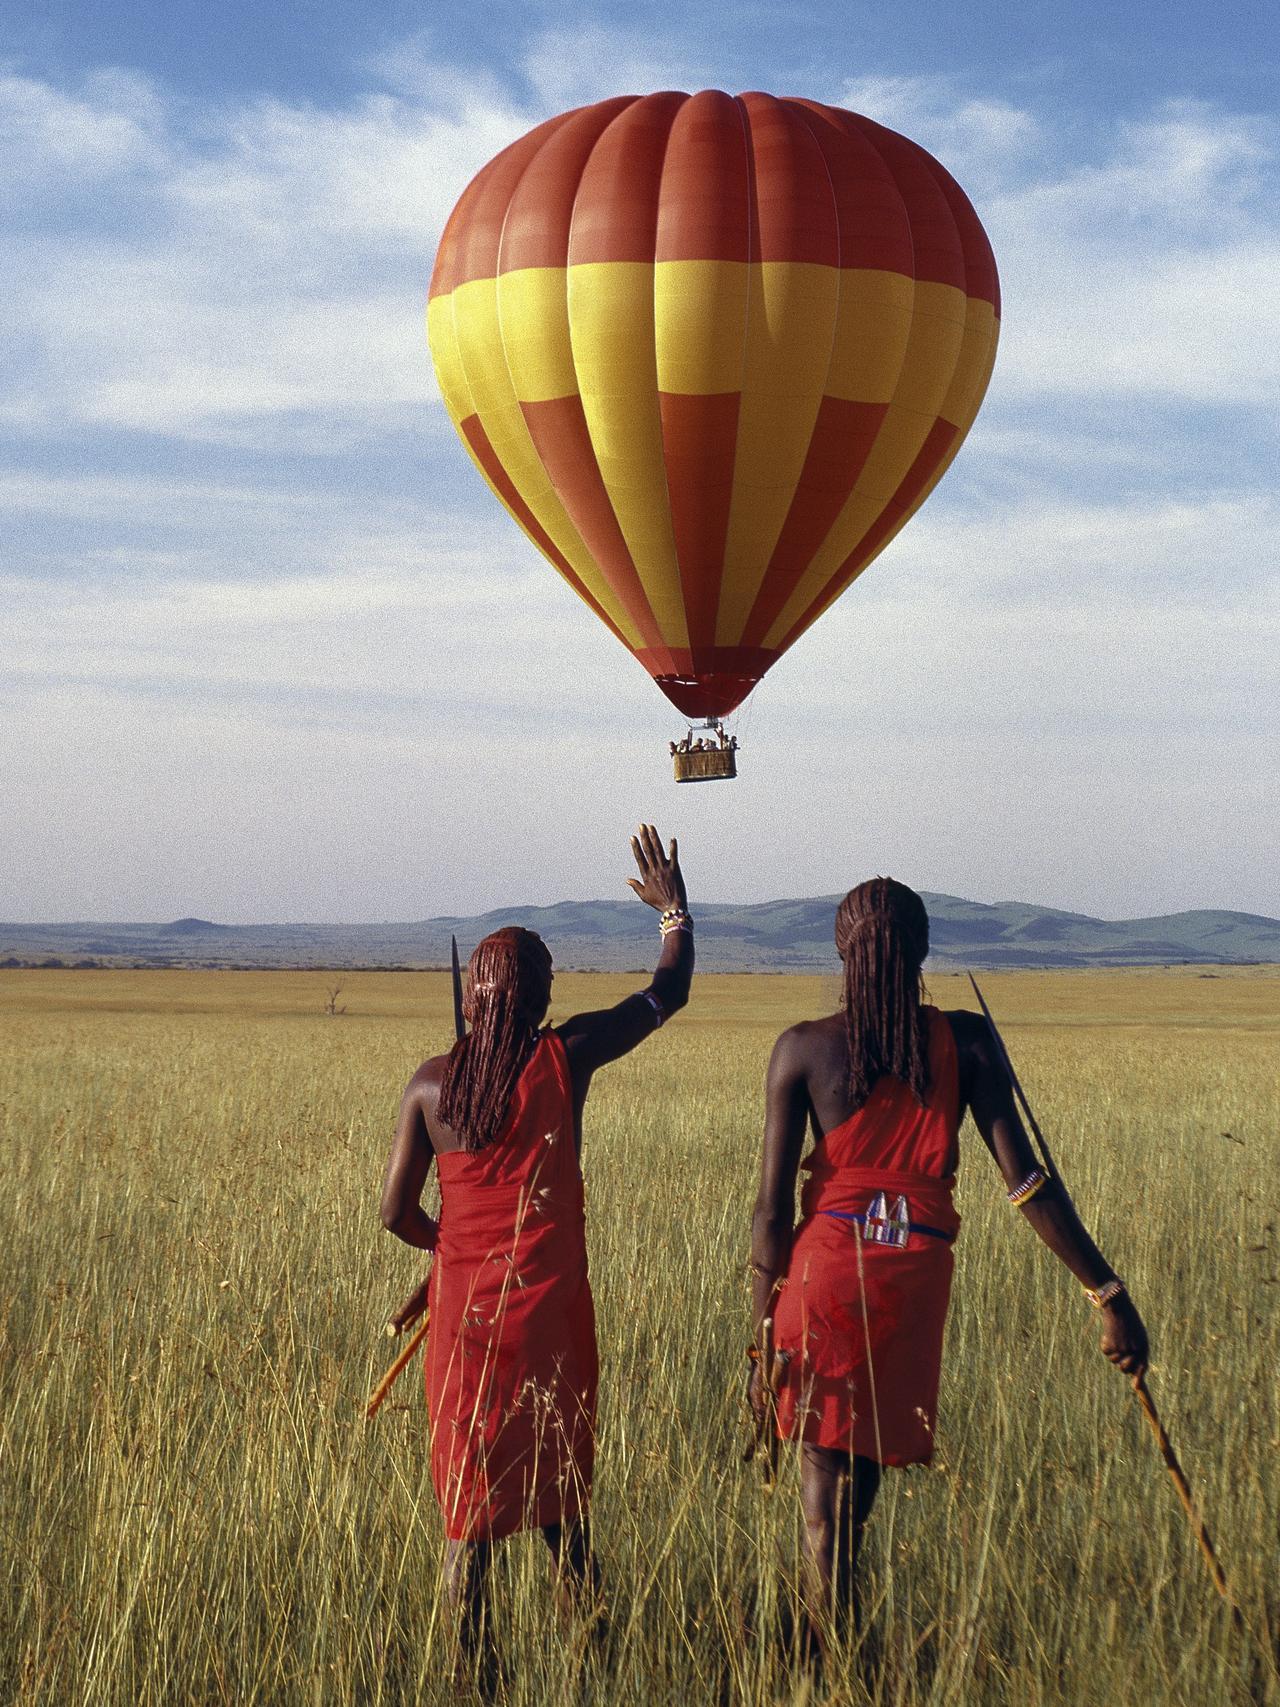 Masai warriors watch a hot-air balloon flight over Masai Mara